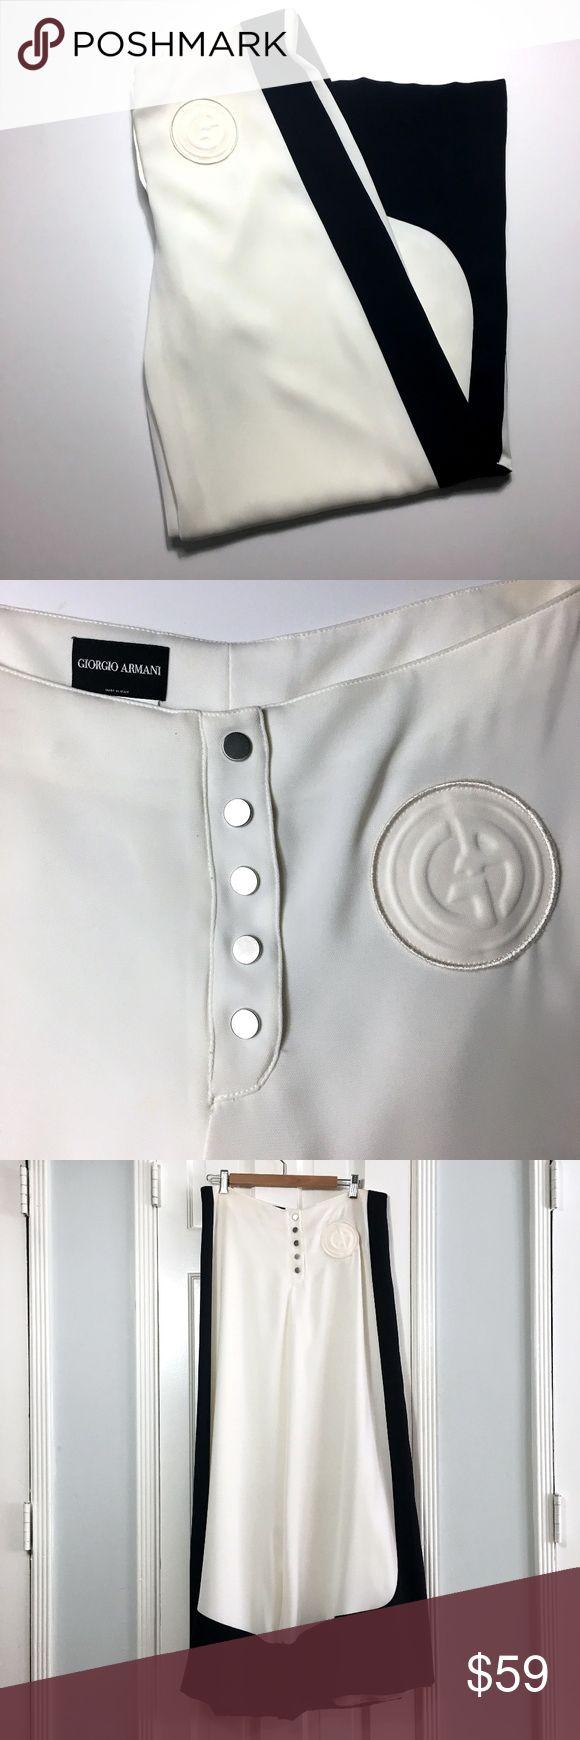 Giorgio Armani White & Blue Wide Leg Pant sz 10 Giorgio Armani White & Blue Wide Leg Pant sz 10 Made in: Italy Size: IT46 - US10 Fit: Wide Leg Waist: 34 Inseam: 33 Material: Polyester Elastic Color: White With Navy Blue Trim Condition: Like New #coxycloset #GiorgioArmani #Armanicollection #MadeInItaly #Fashion #Chic #Womenswear #Business Casual #Formal #PlusSize #pants #widepants #wideleg #oversized Giorgio Armani Pants Wide Leg